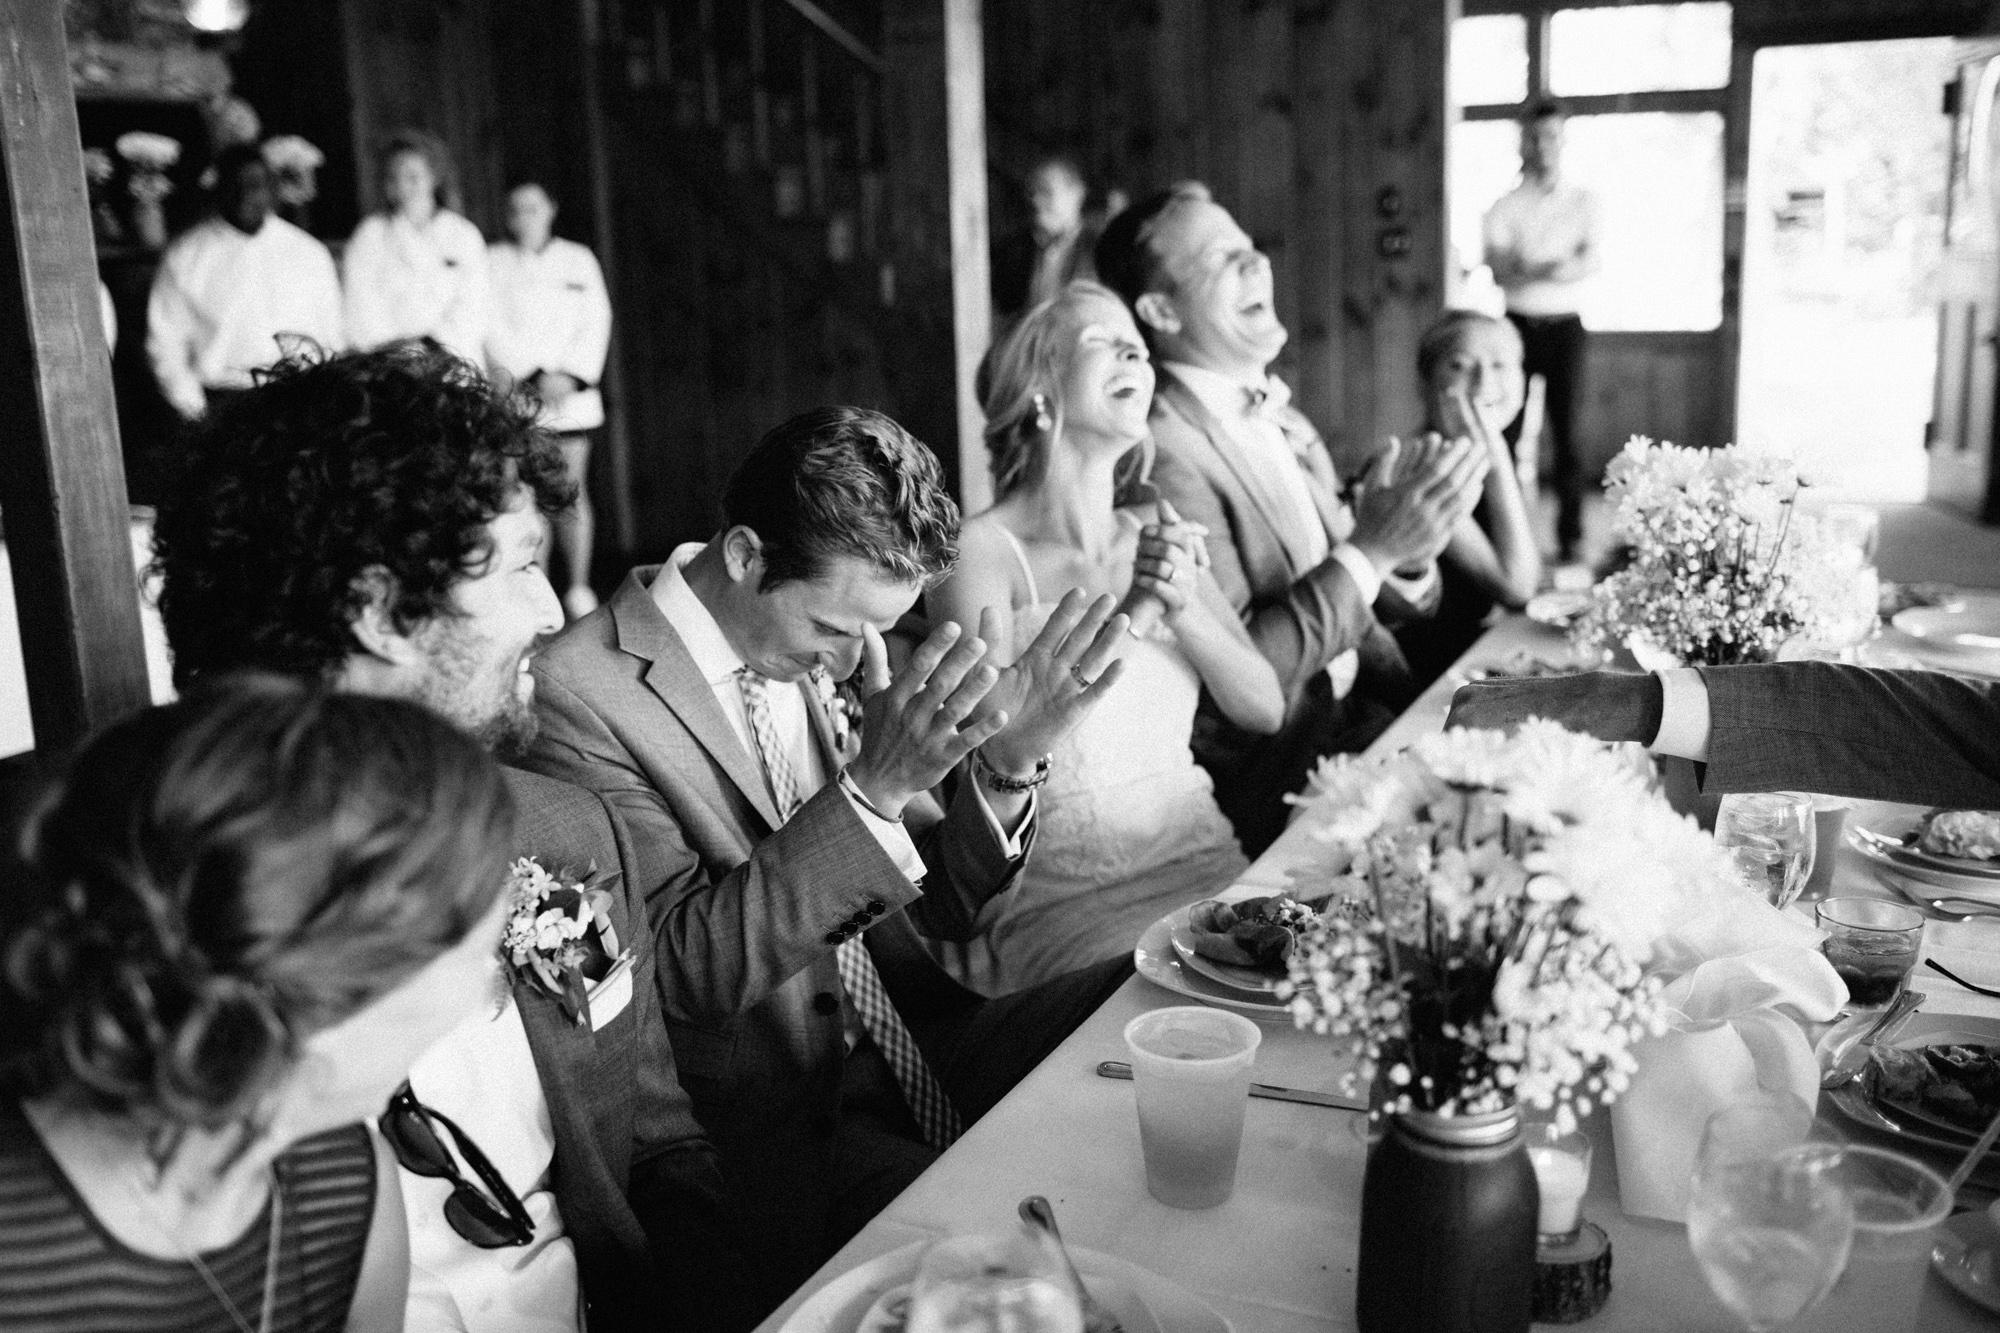 0620_jamiemercurio_boothbay_wedding_maine-117.jpg